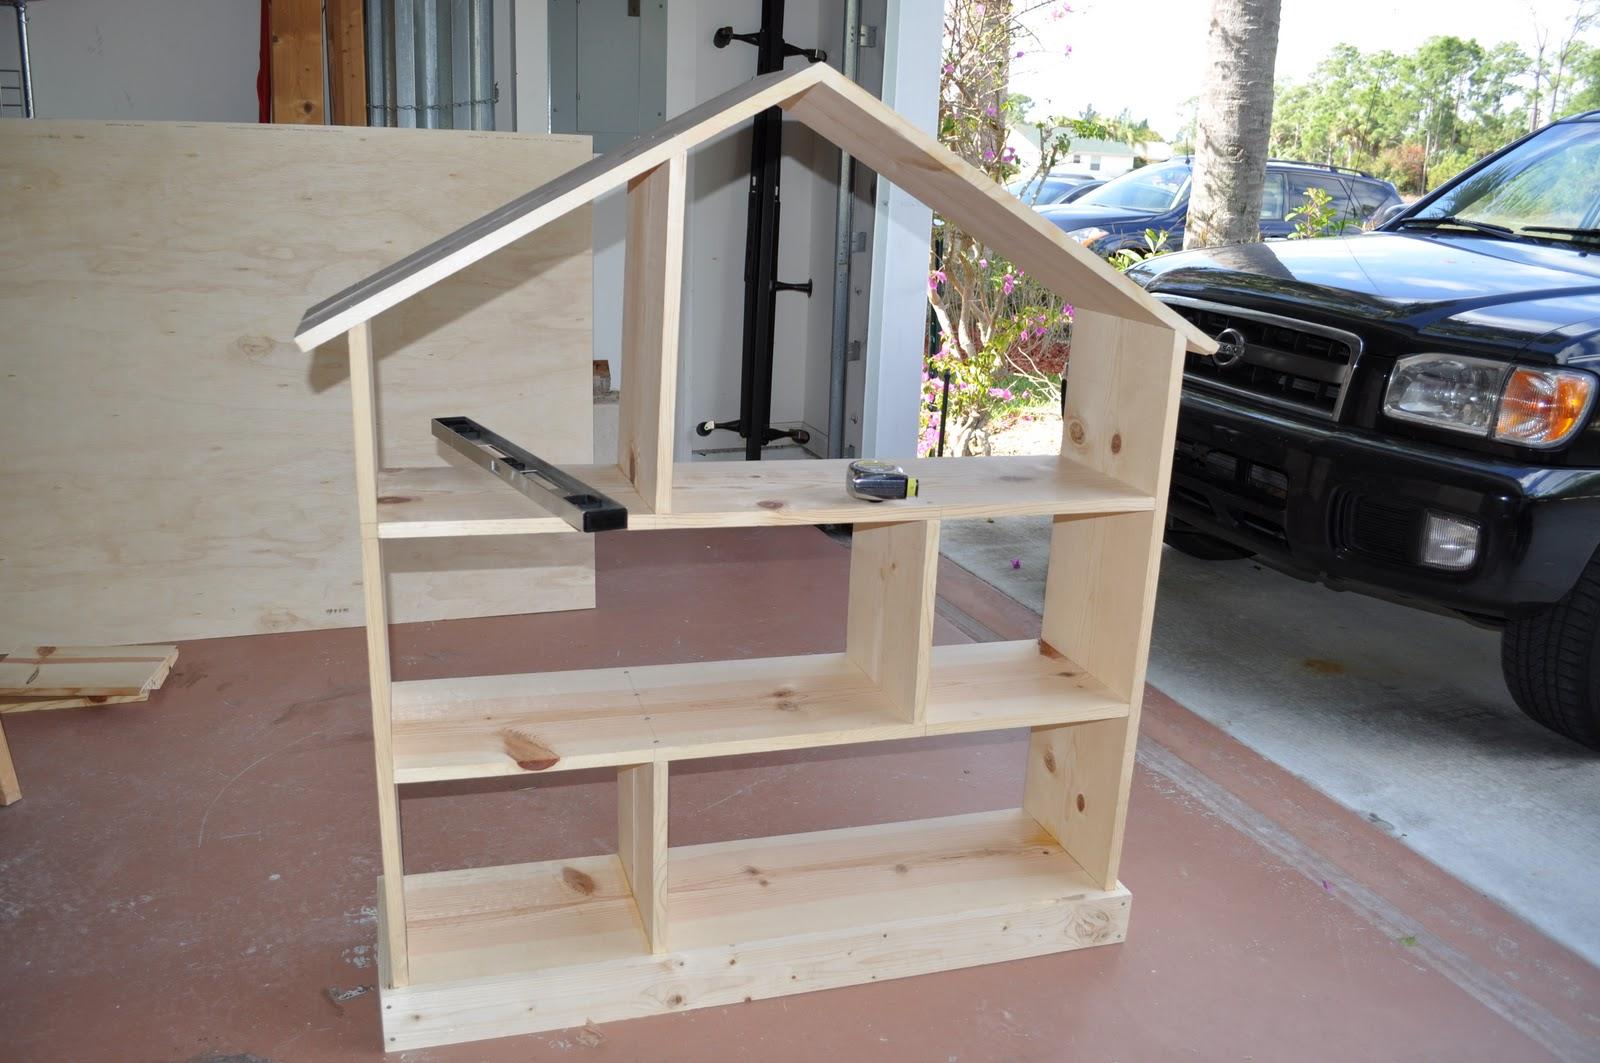 Dollhouse Bookcase Diy: A Sweet Life: DIY Dollhouse Bookcase